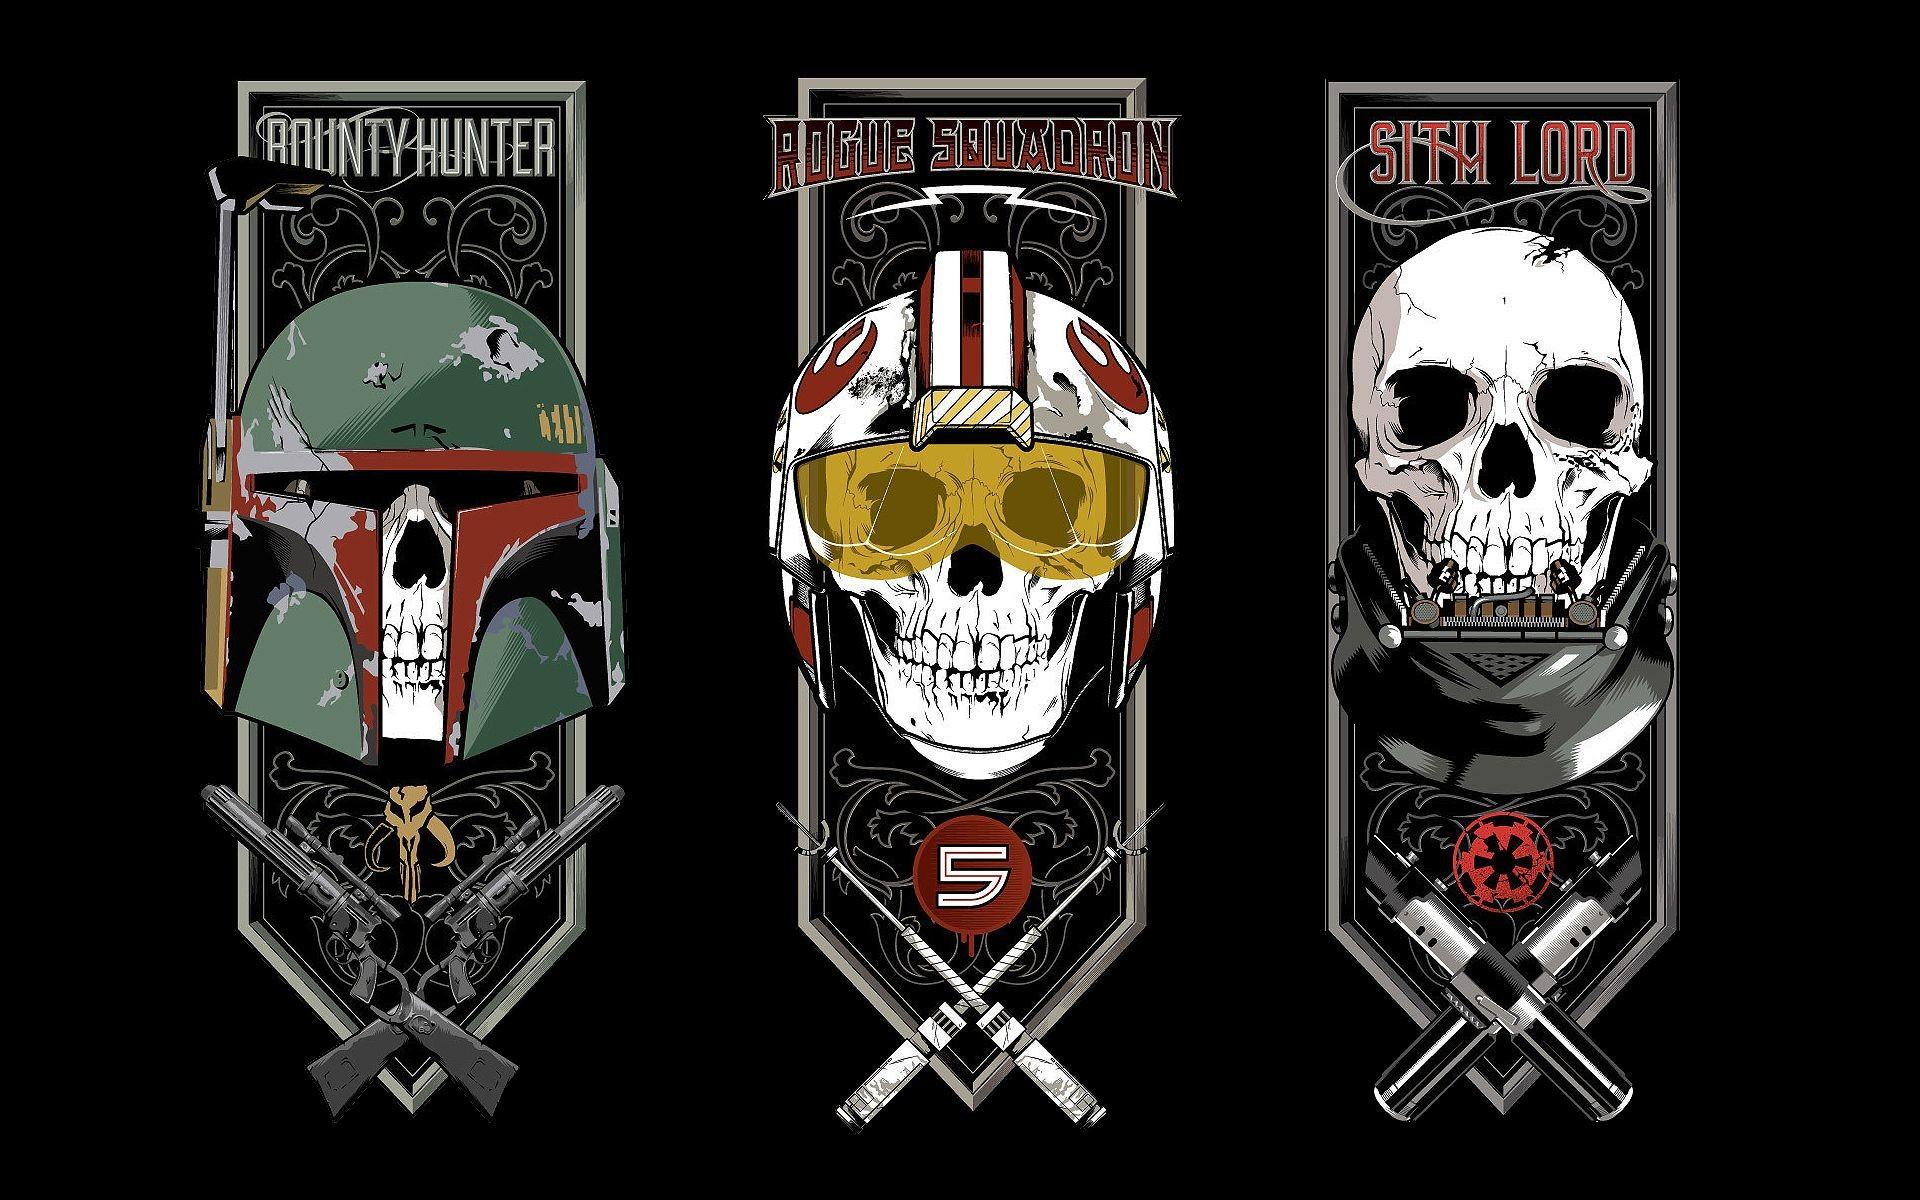 Star Wars Pulp Fiction